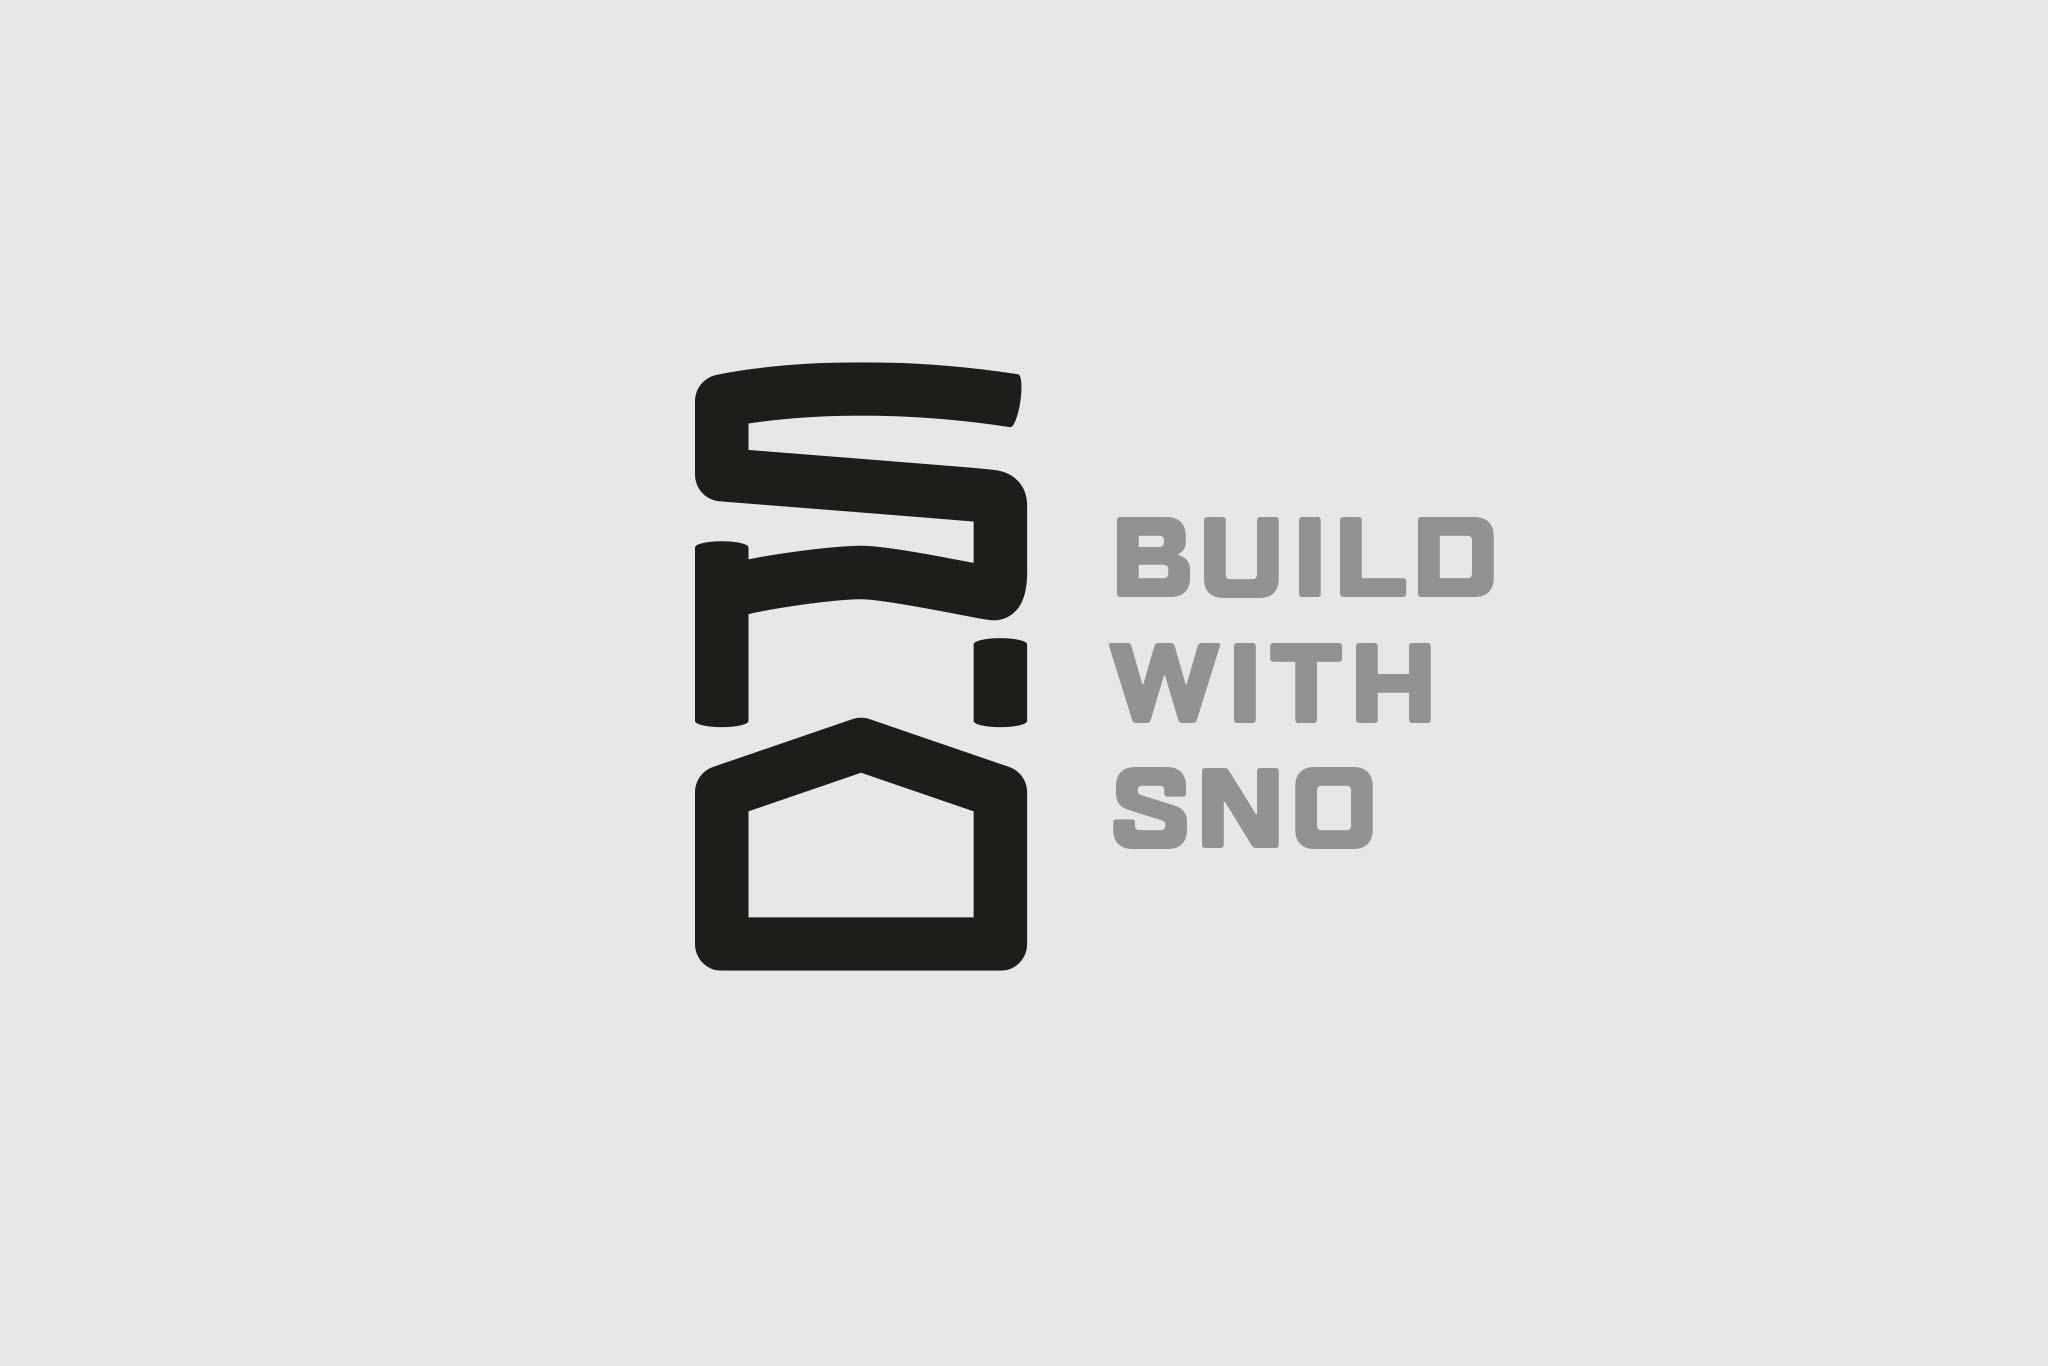 build-wth-sno-branding_2